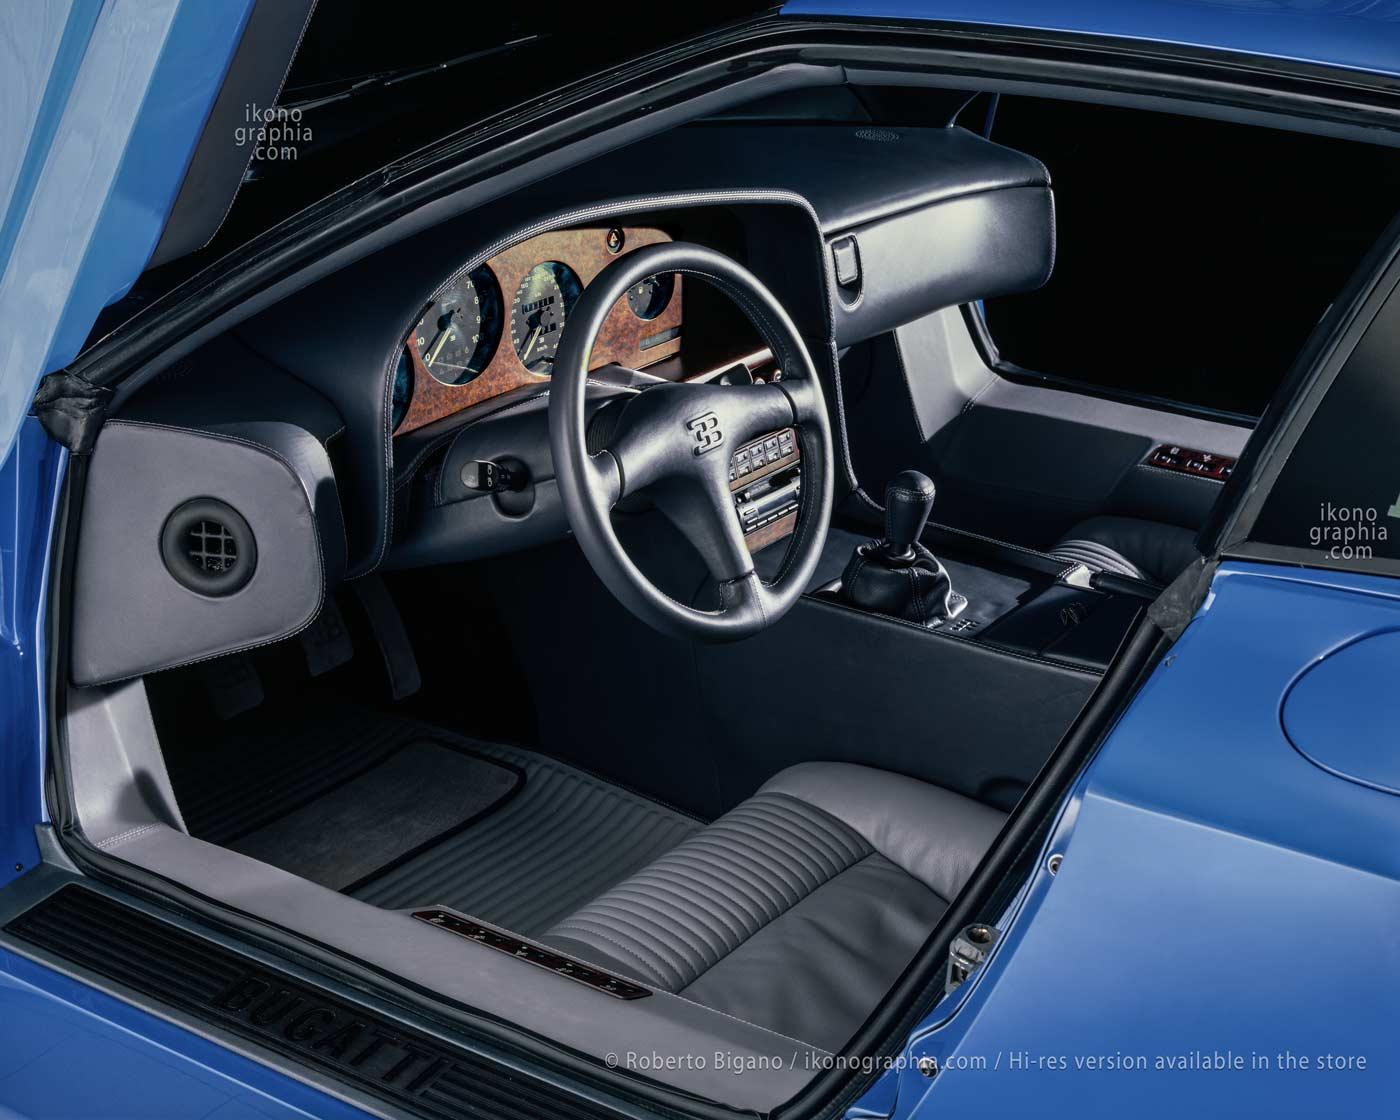 The interior of the Bugatti EB110. In the center of the steering wheel, the EB logo. Photo Roberto Bigano. Buy this image in the ikonographia.com store.